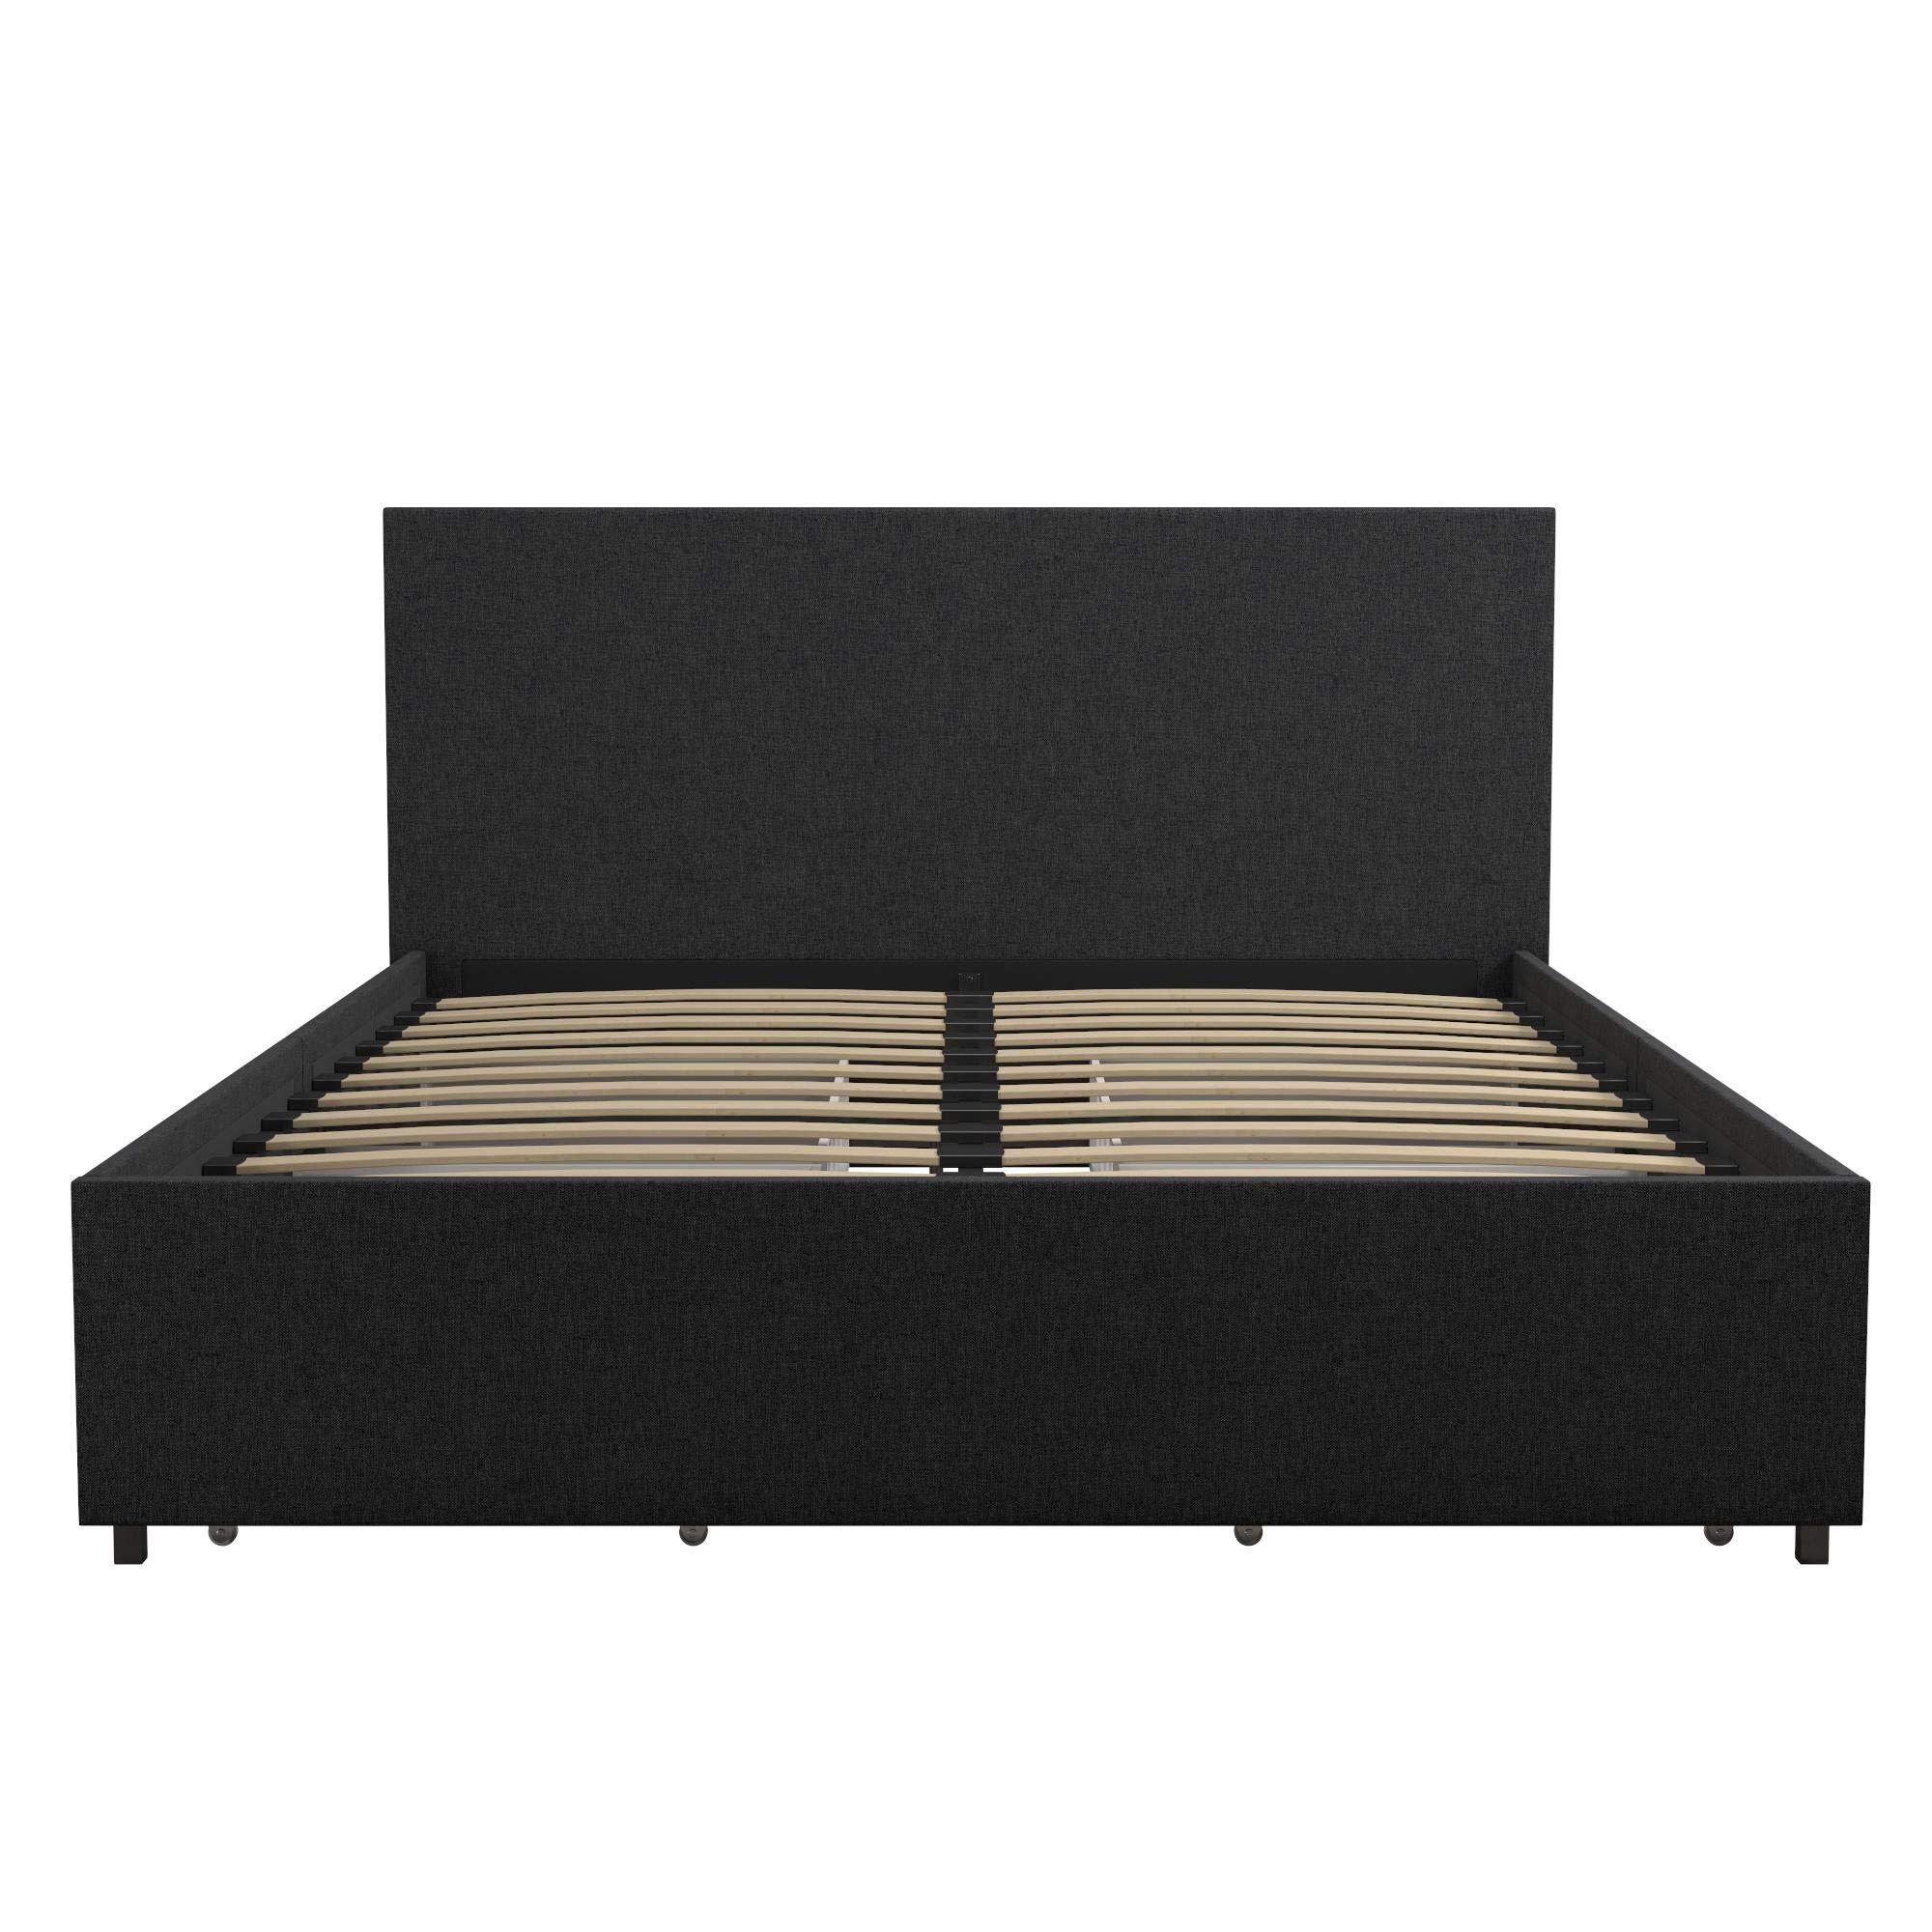 Novogratz Kelly Bed with Storage, Queen, Dark Gray Linen by Novogratz (Image #15)